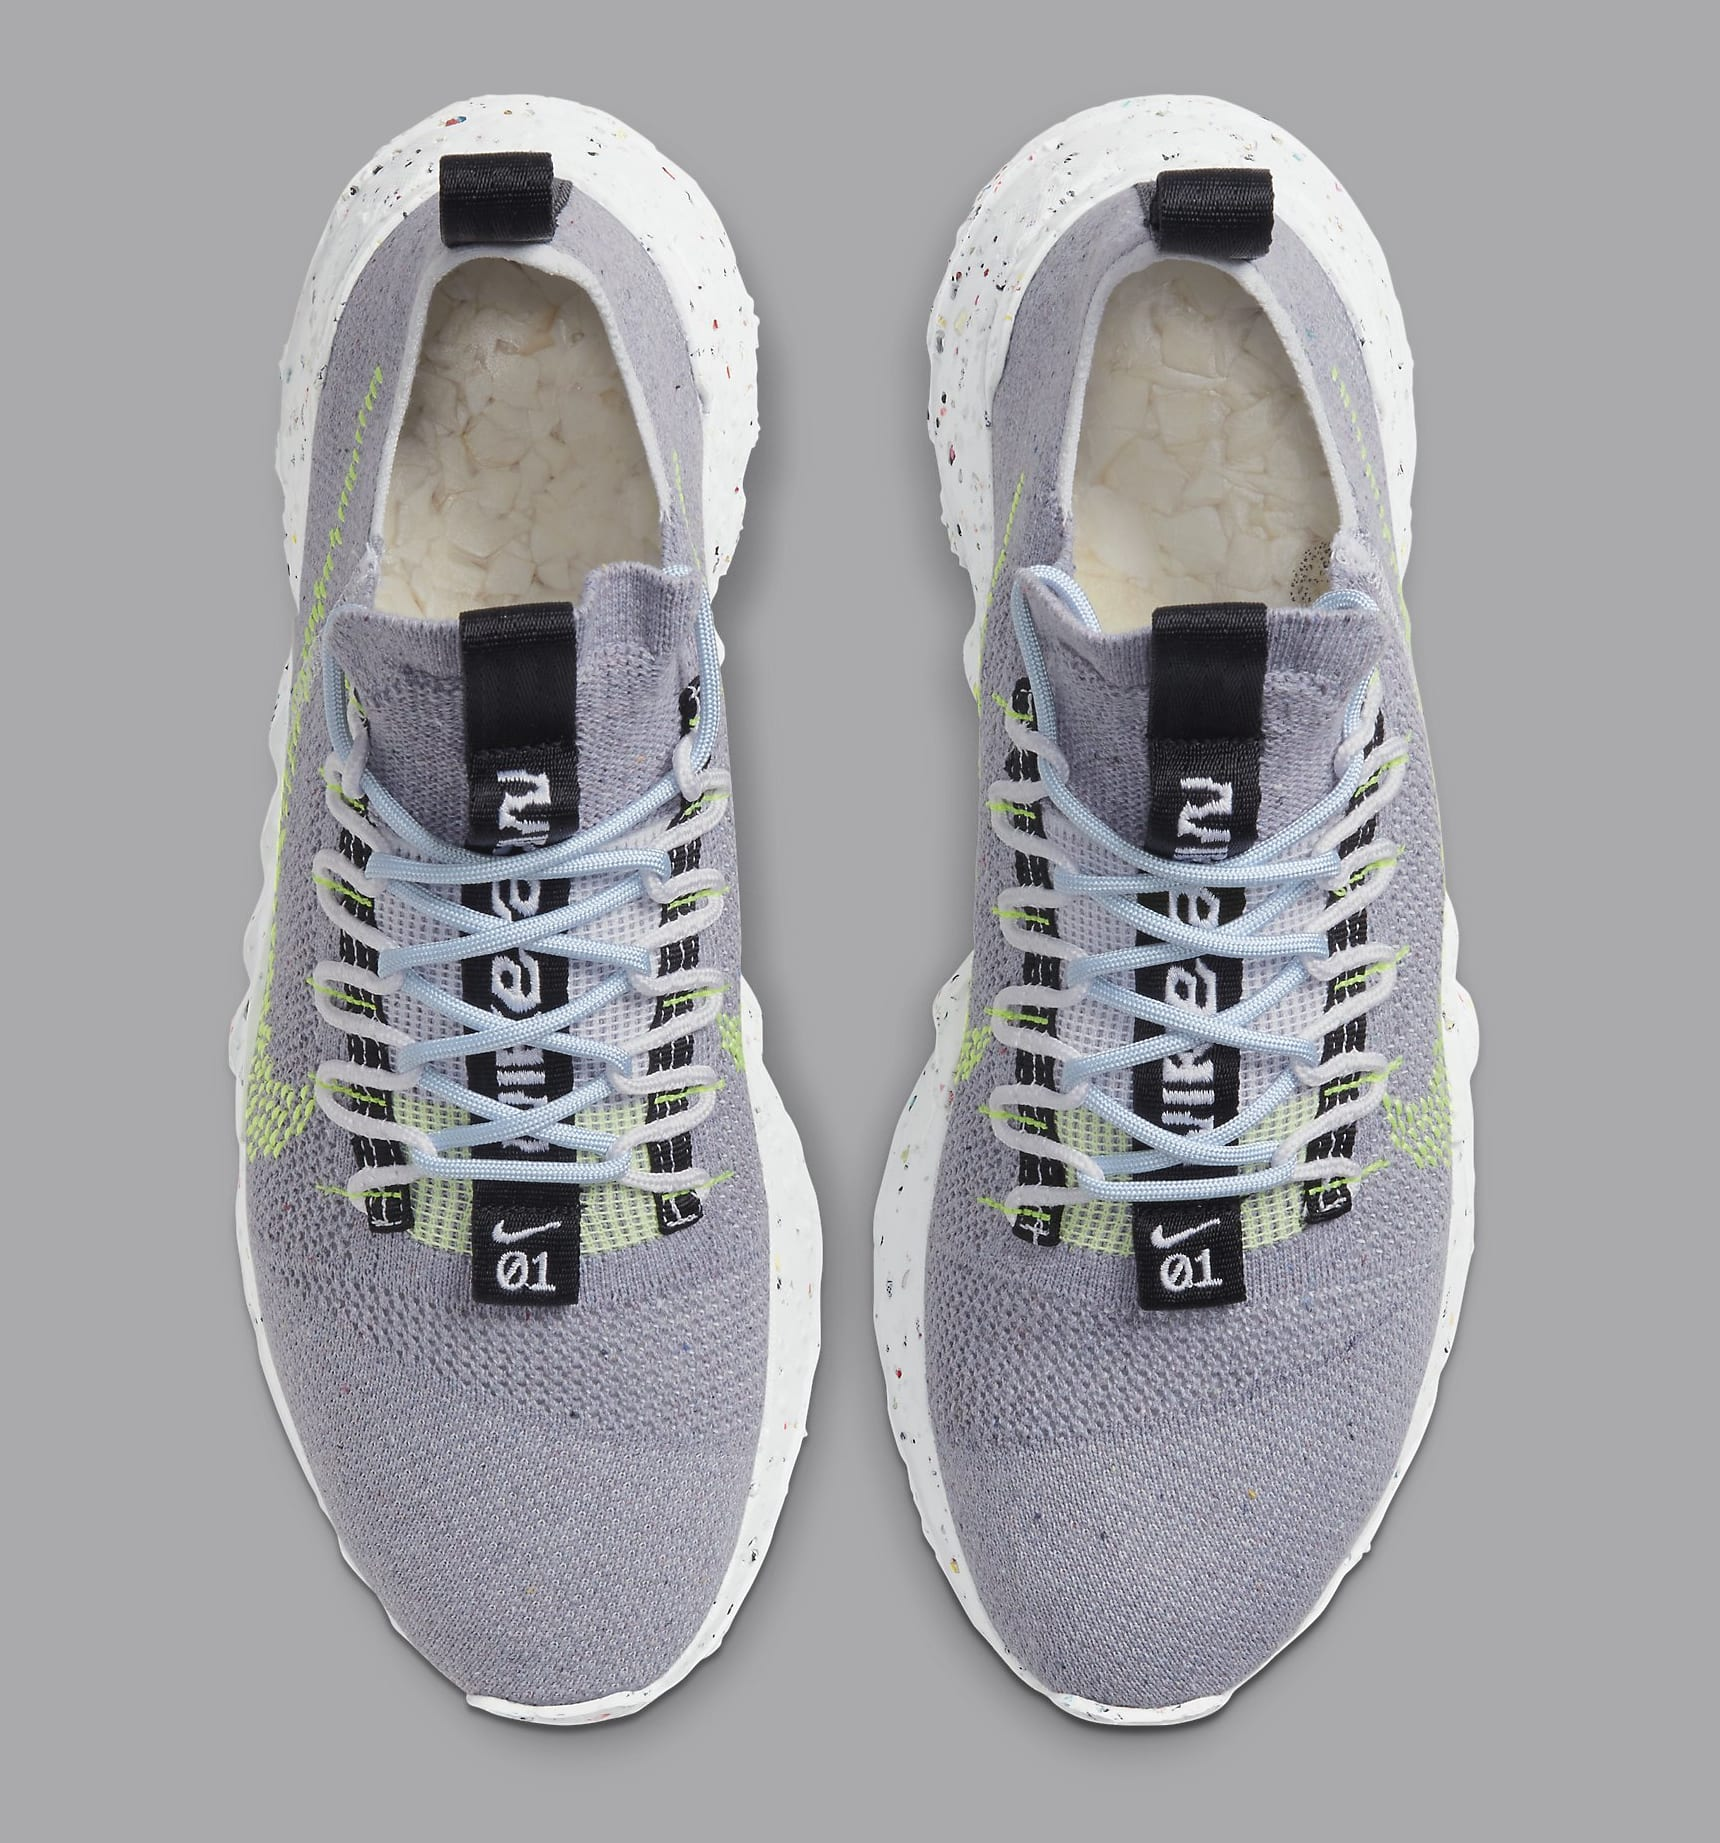 Nike Space Hippie 01 'Grey/Volt' CQ3986-002 Top